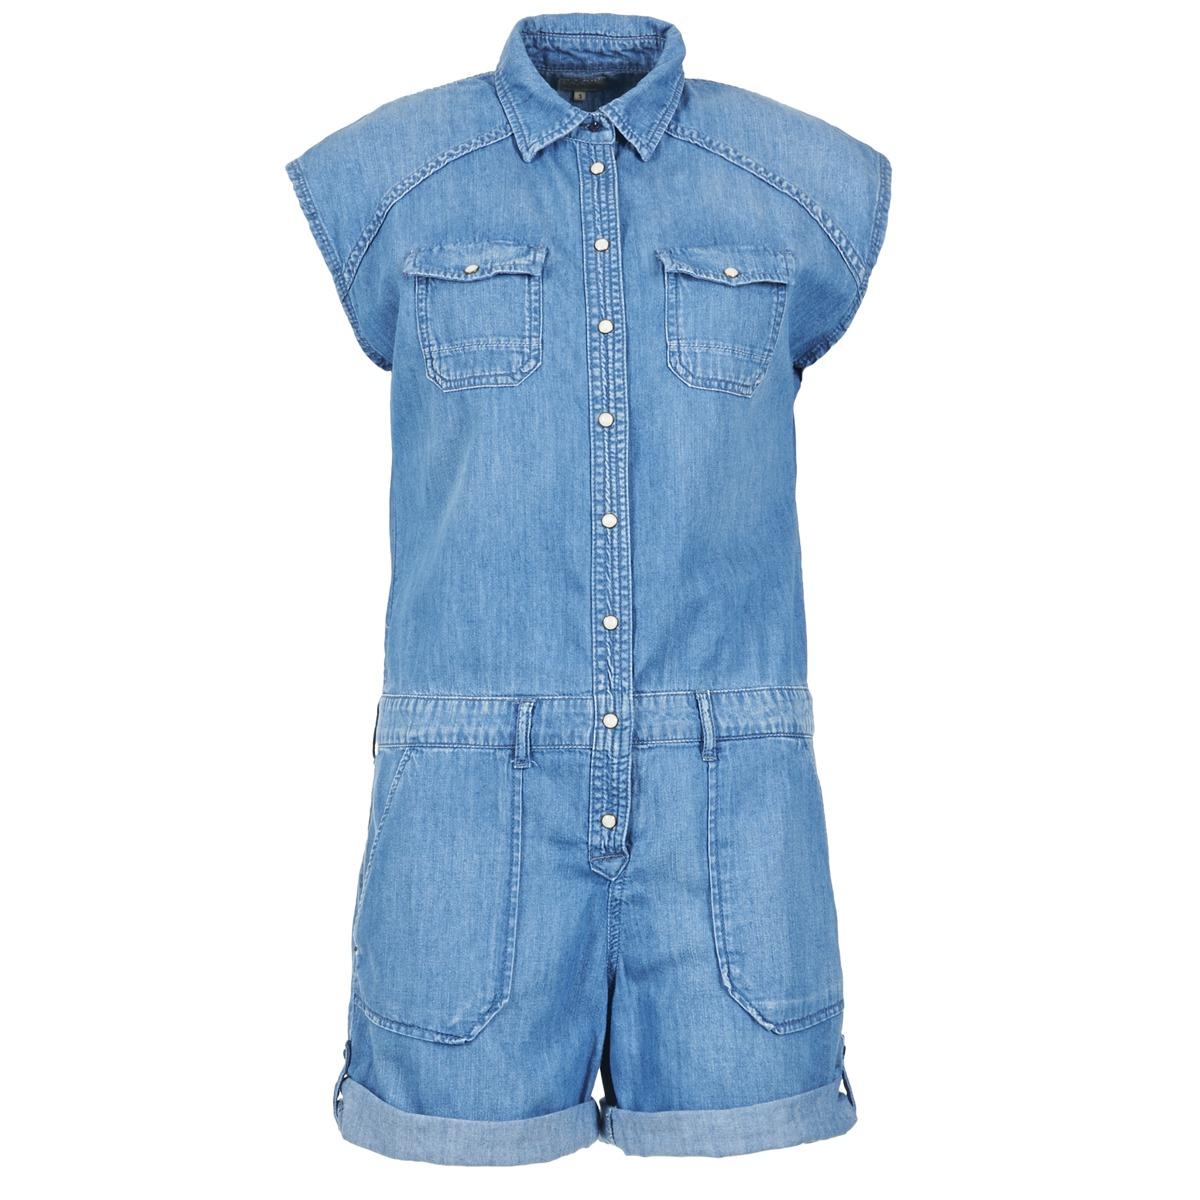 Combinaisons Pepe jeans IVY Jean